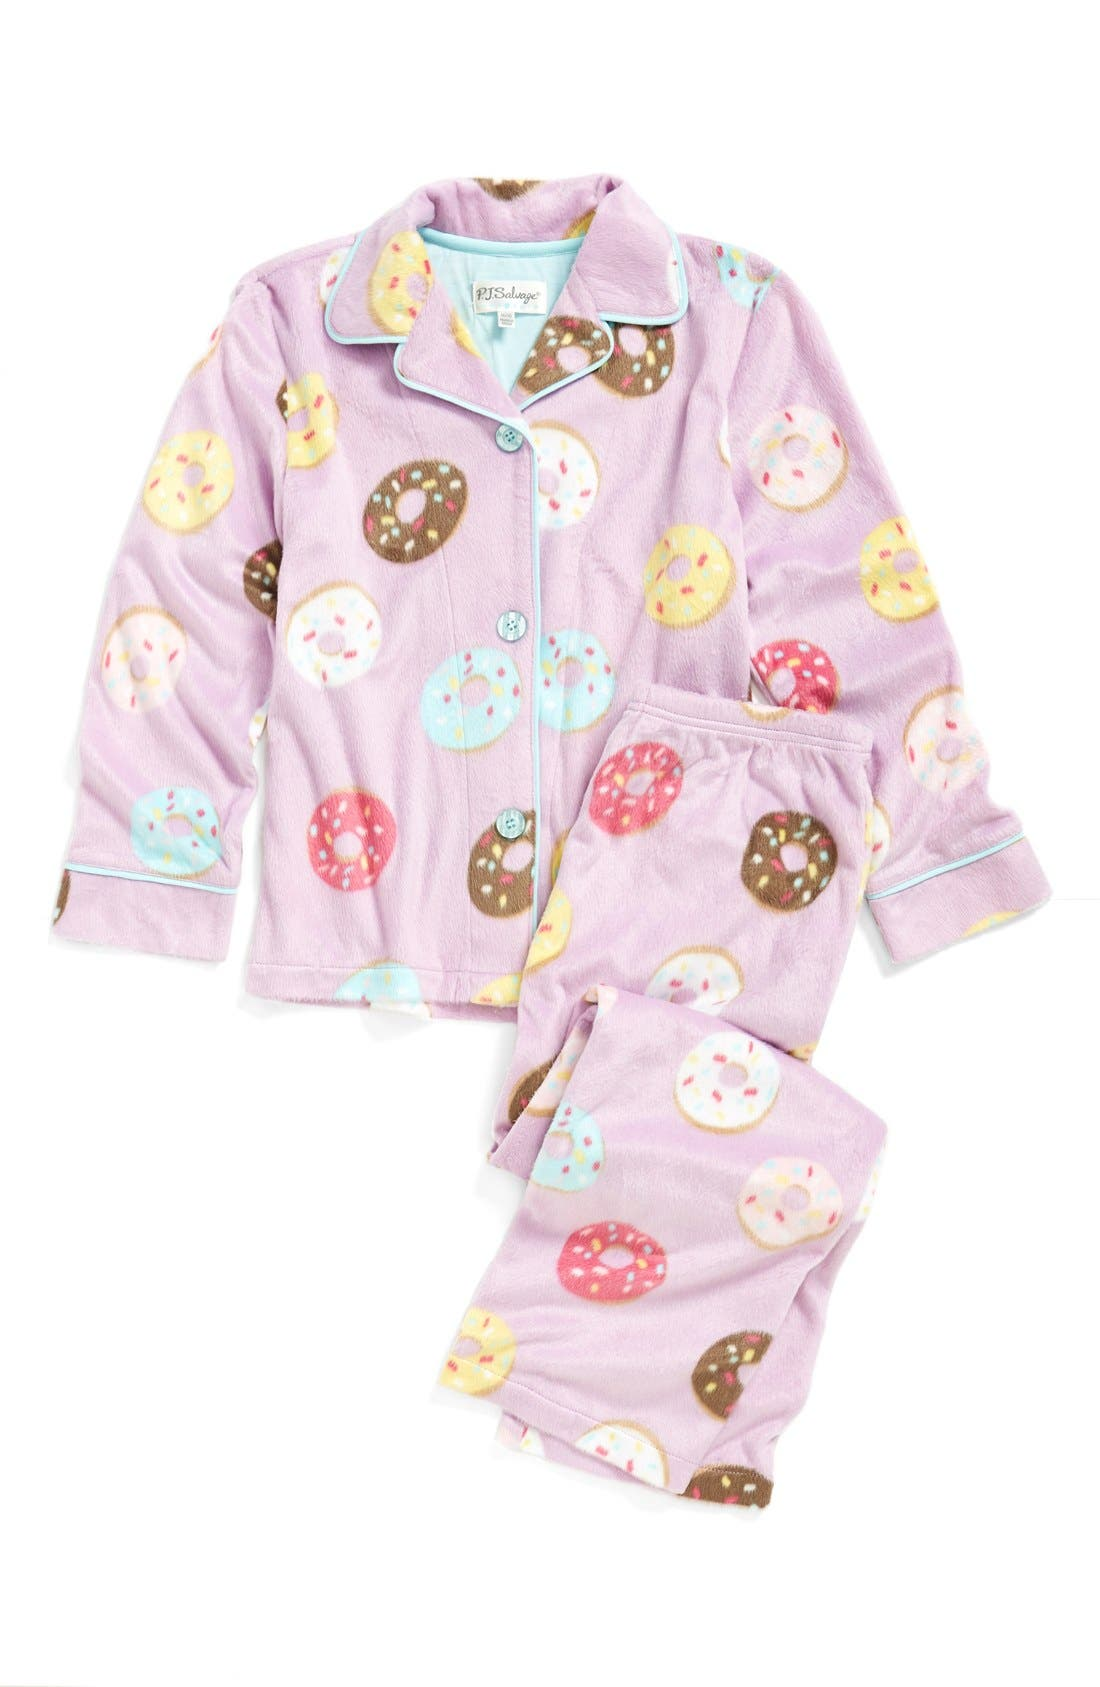 Main Image - PJ Salvage 'Donut' Two-Piece Pajamas (Little Girls & Big Girls)